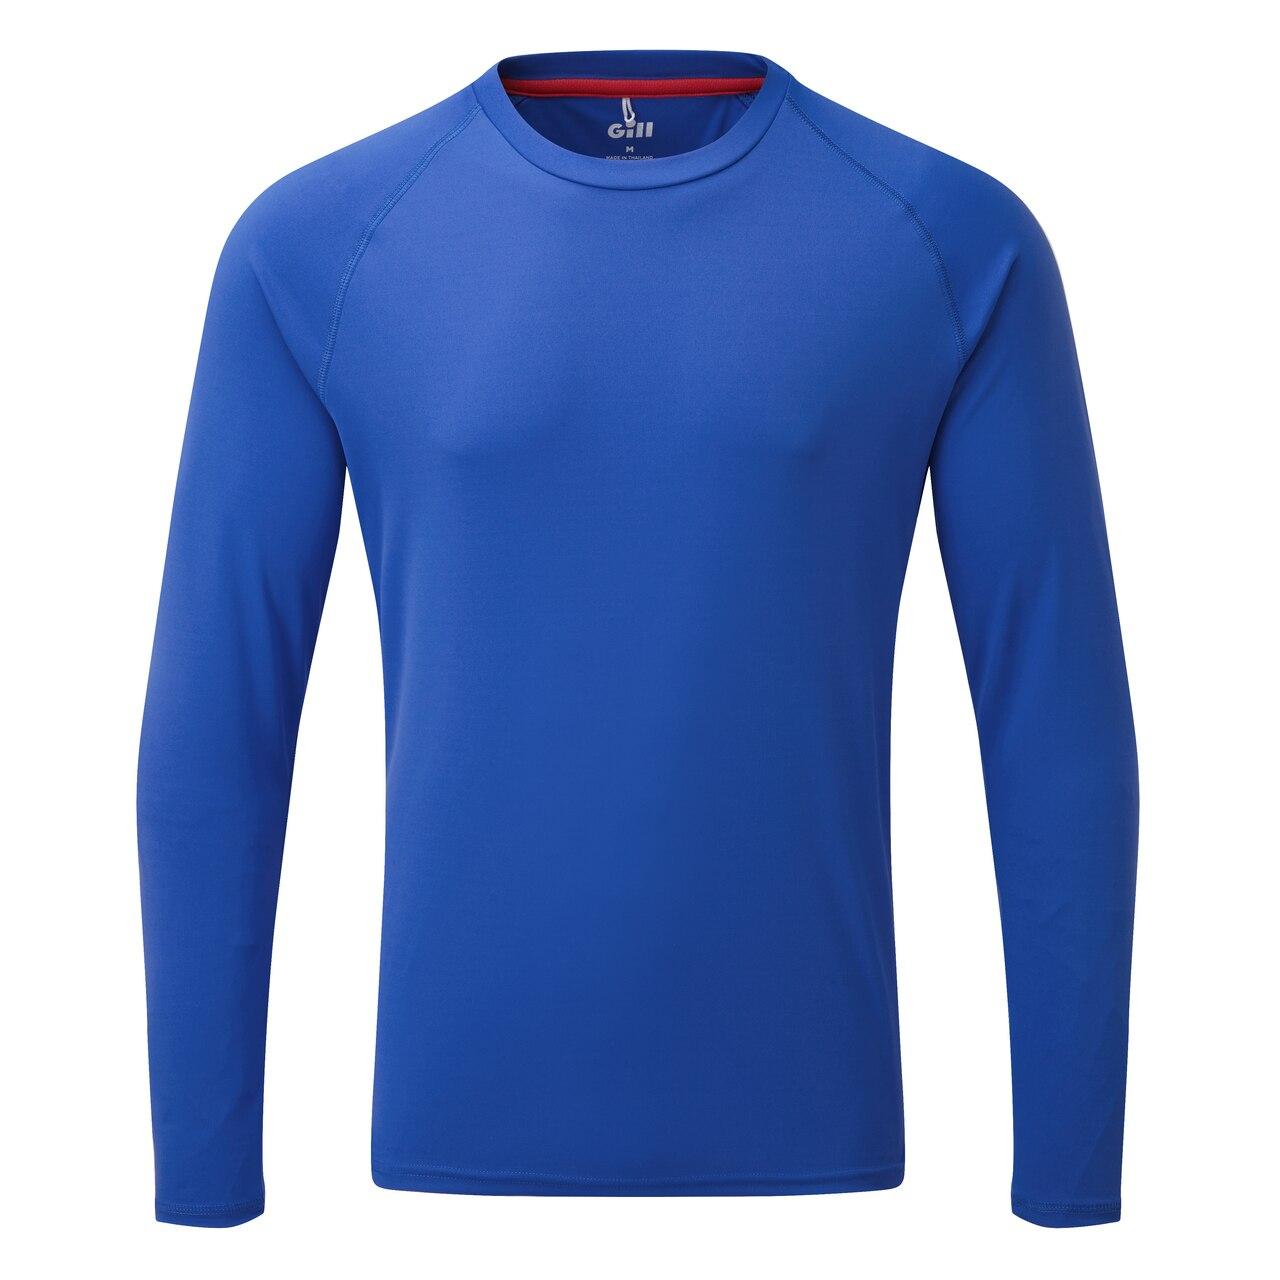 Men's UV Tec Long Sleeve Tee - UV011-BLU01-1.jpg